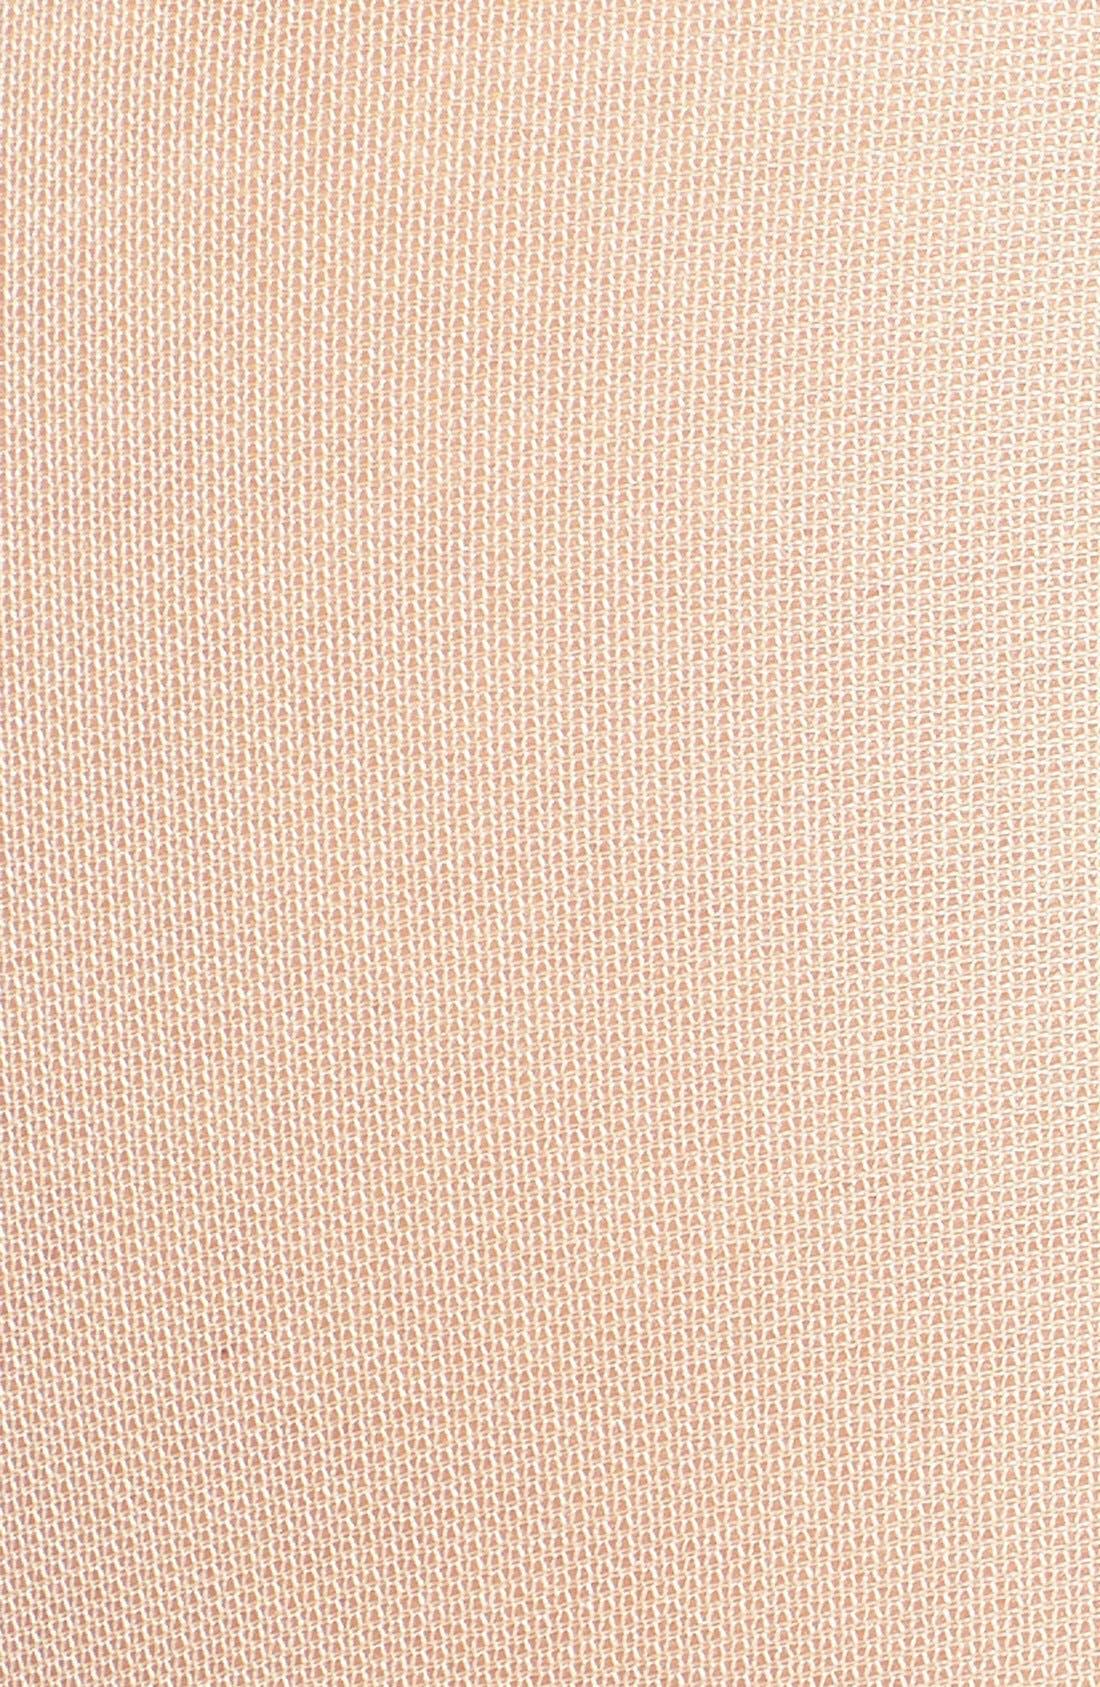 Alternate Image 2  - Calvin Klein 'Sheer Essentials - Matte Ultra Sheer' Control Top Pantyhose